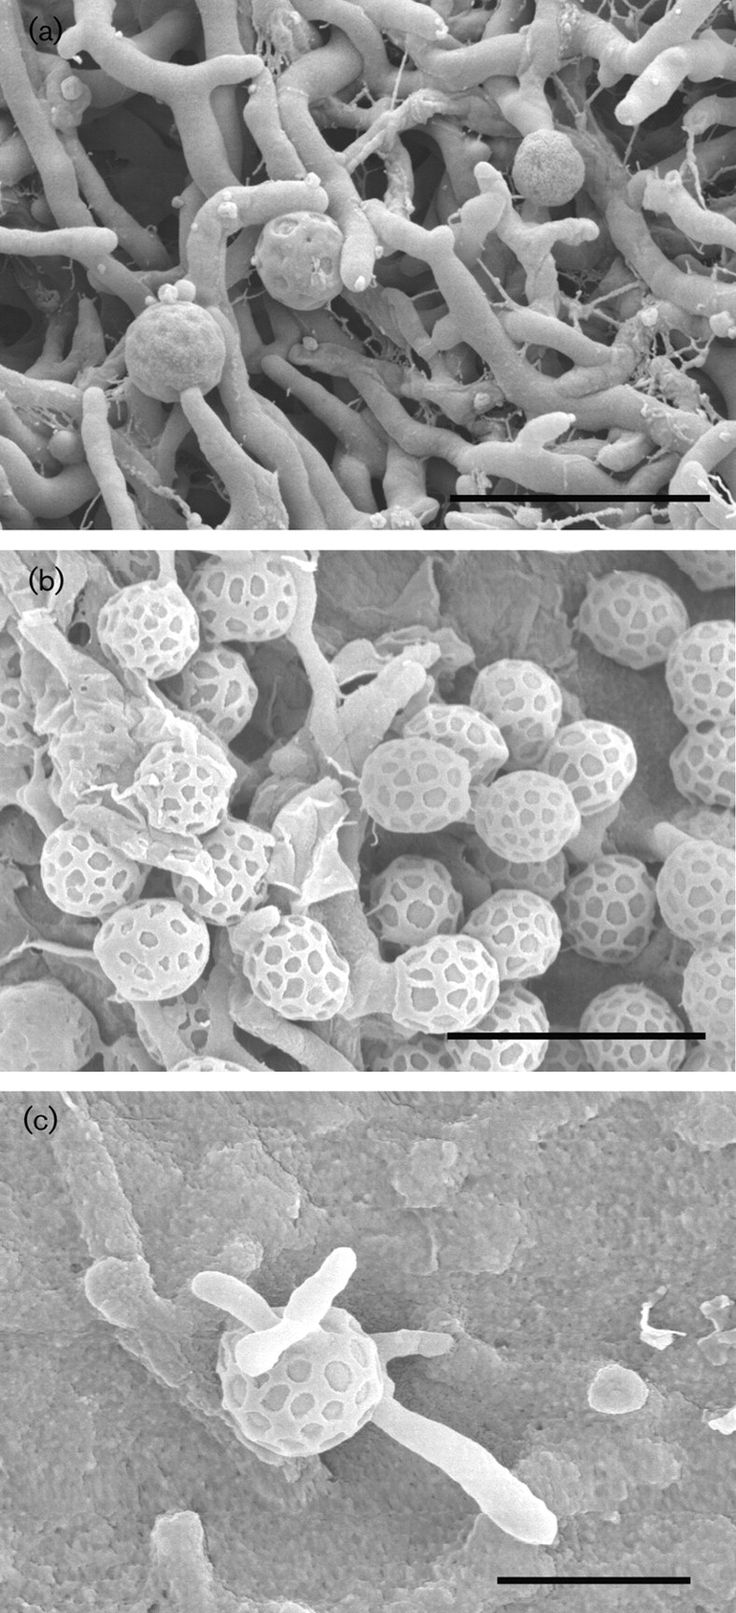 (a) Rugosimonospora acidiphila  (b, c) Rugosimonospora africana  [000.008.516]